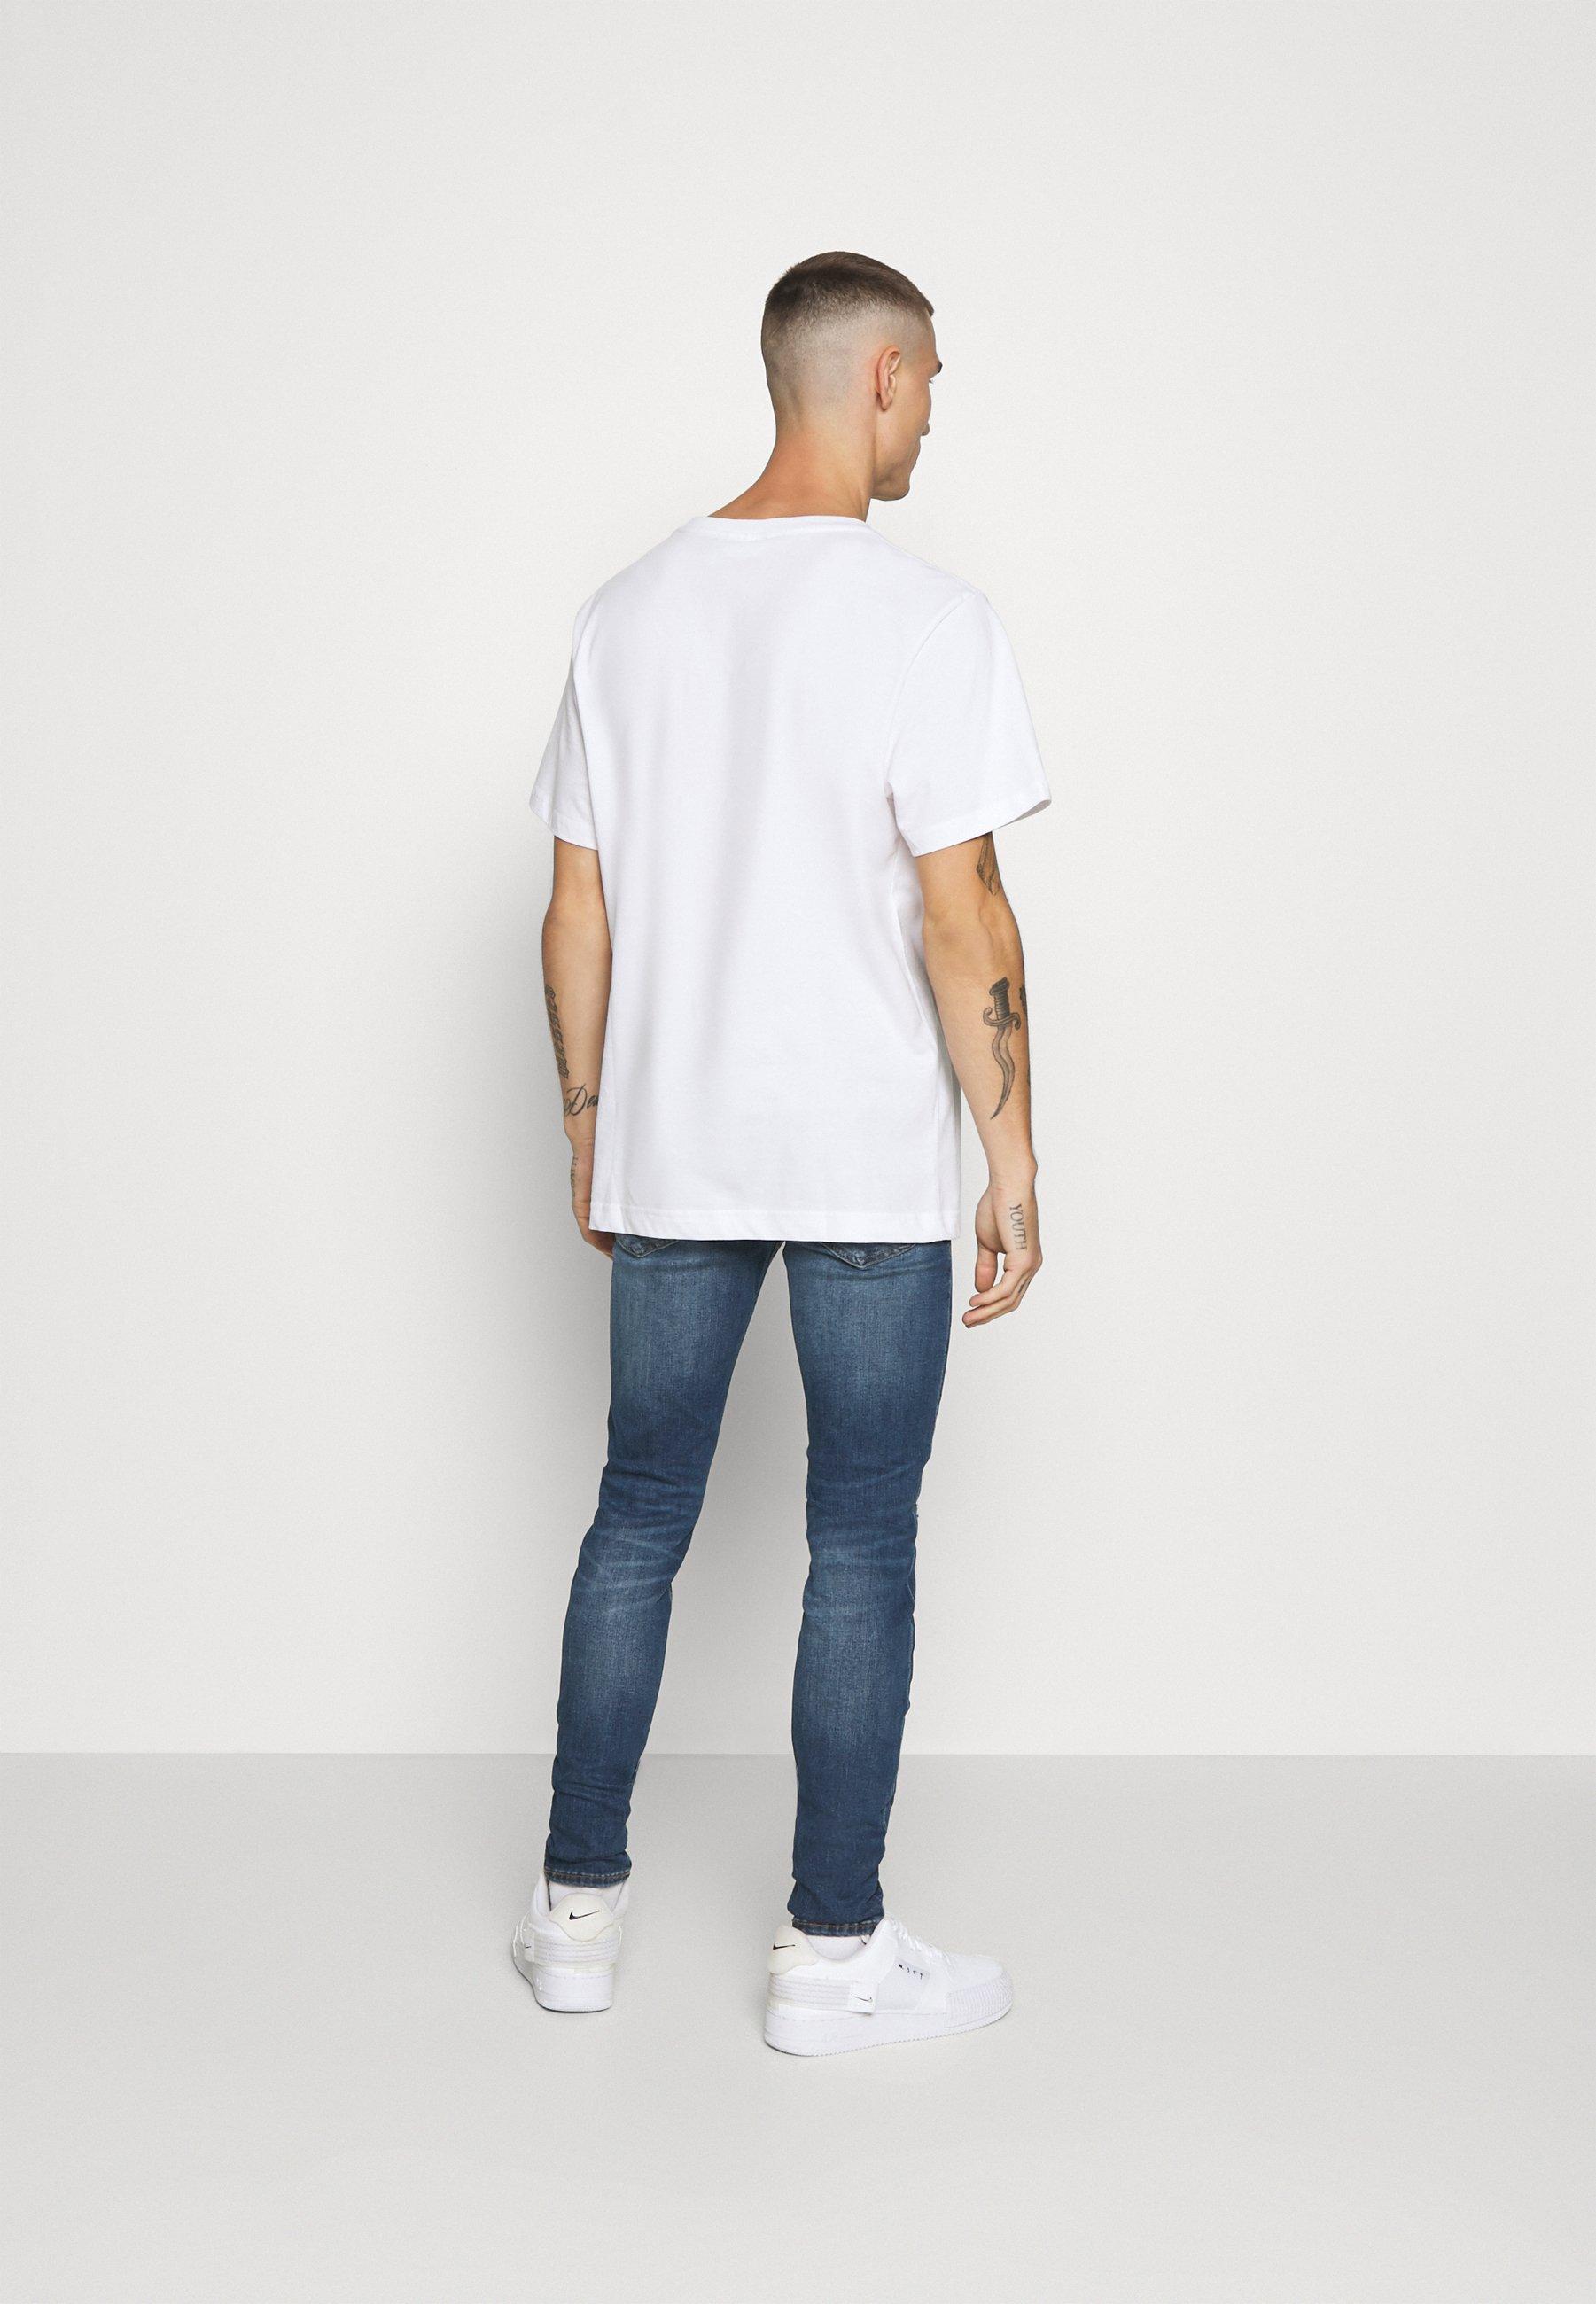 New Arrival Fashion Fast Express Men's Clothing Jack & Jones JJILIAM JJORIGINAL Jeans Skinny Fit blue denim xbZYtKMDf Jz5NcCU04